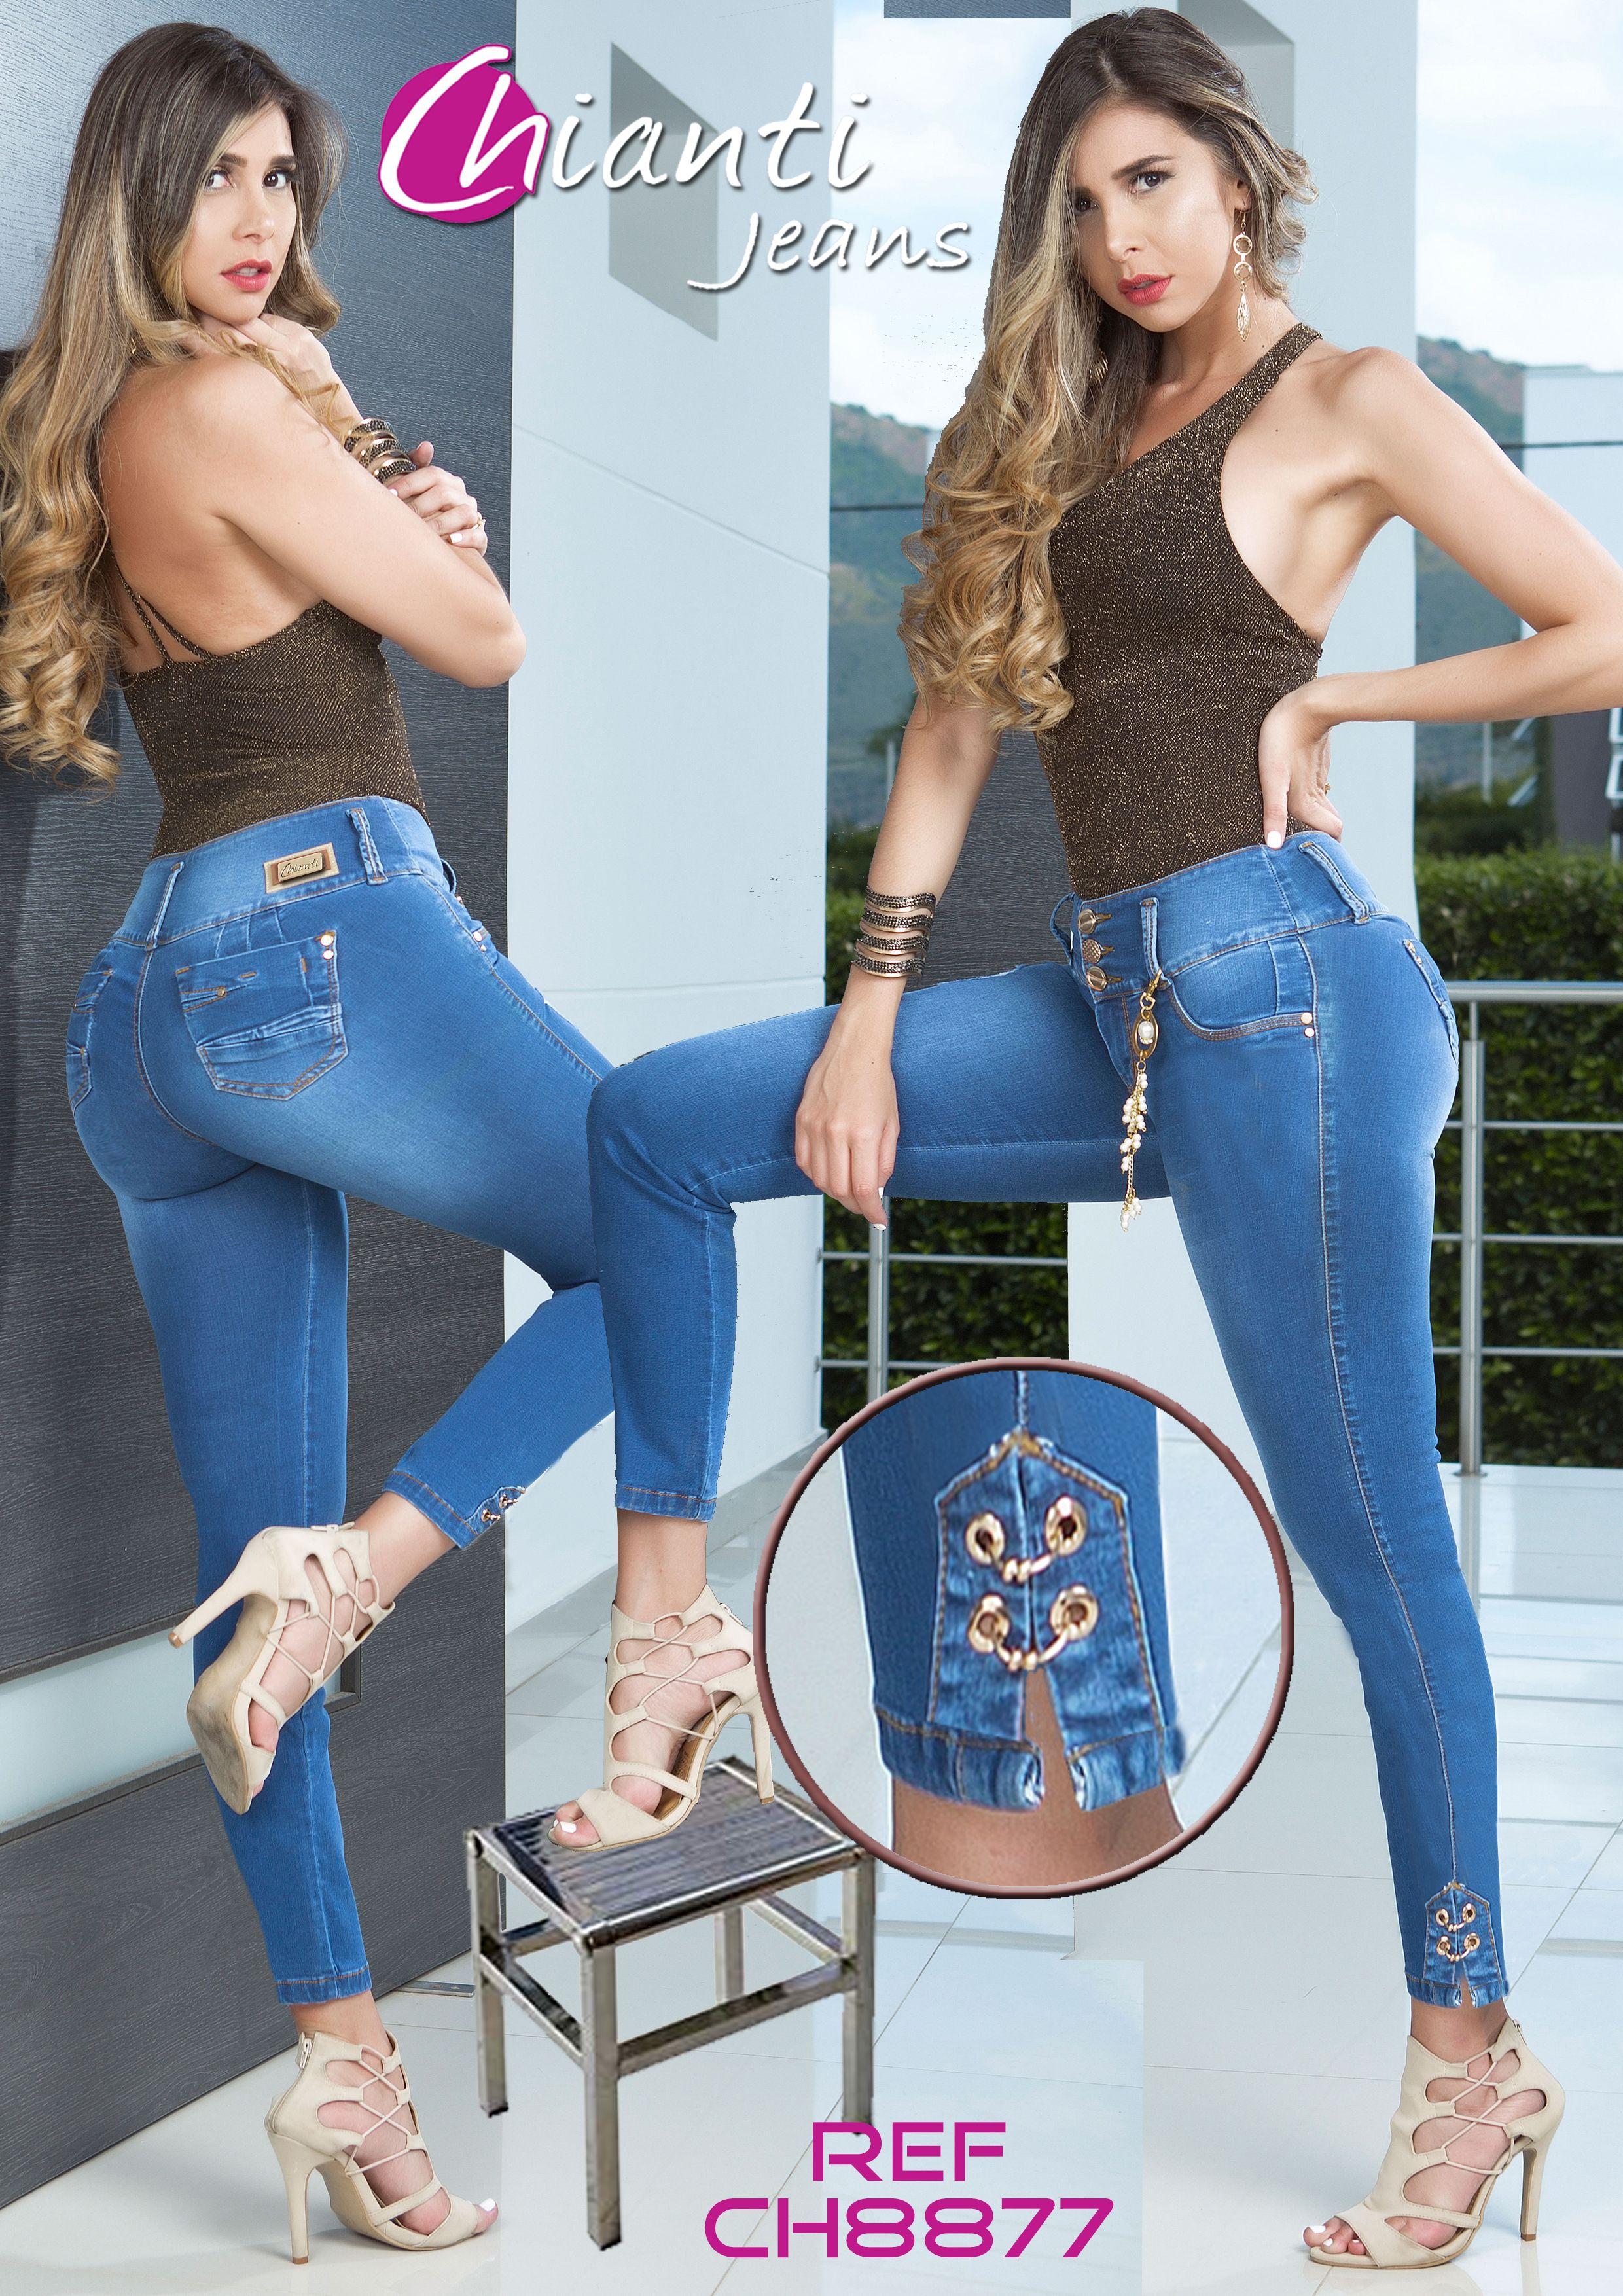 Pin En Pantalones Colombianos Chianti Jeans